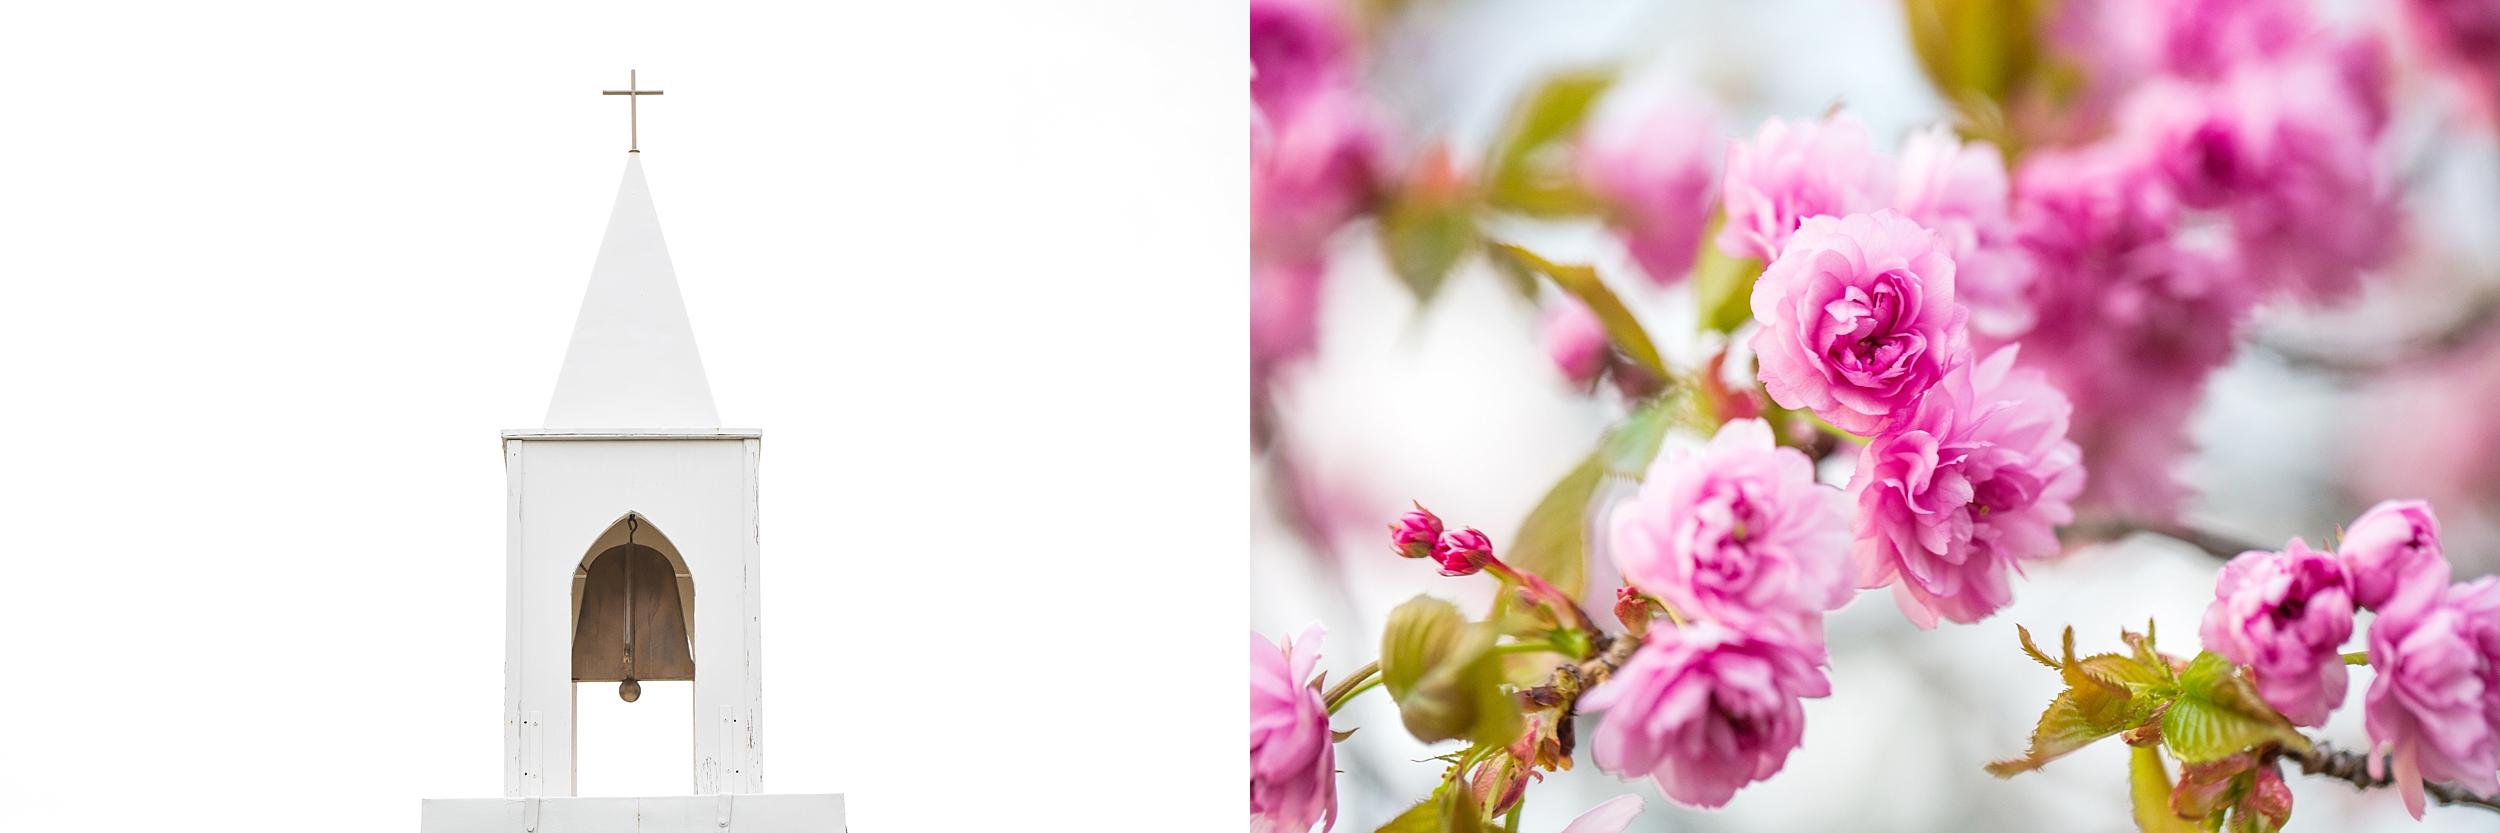 niagarafallsbotanical gardens-engagement_0031.jpg